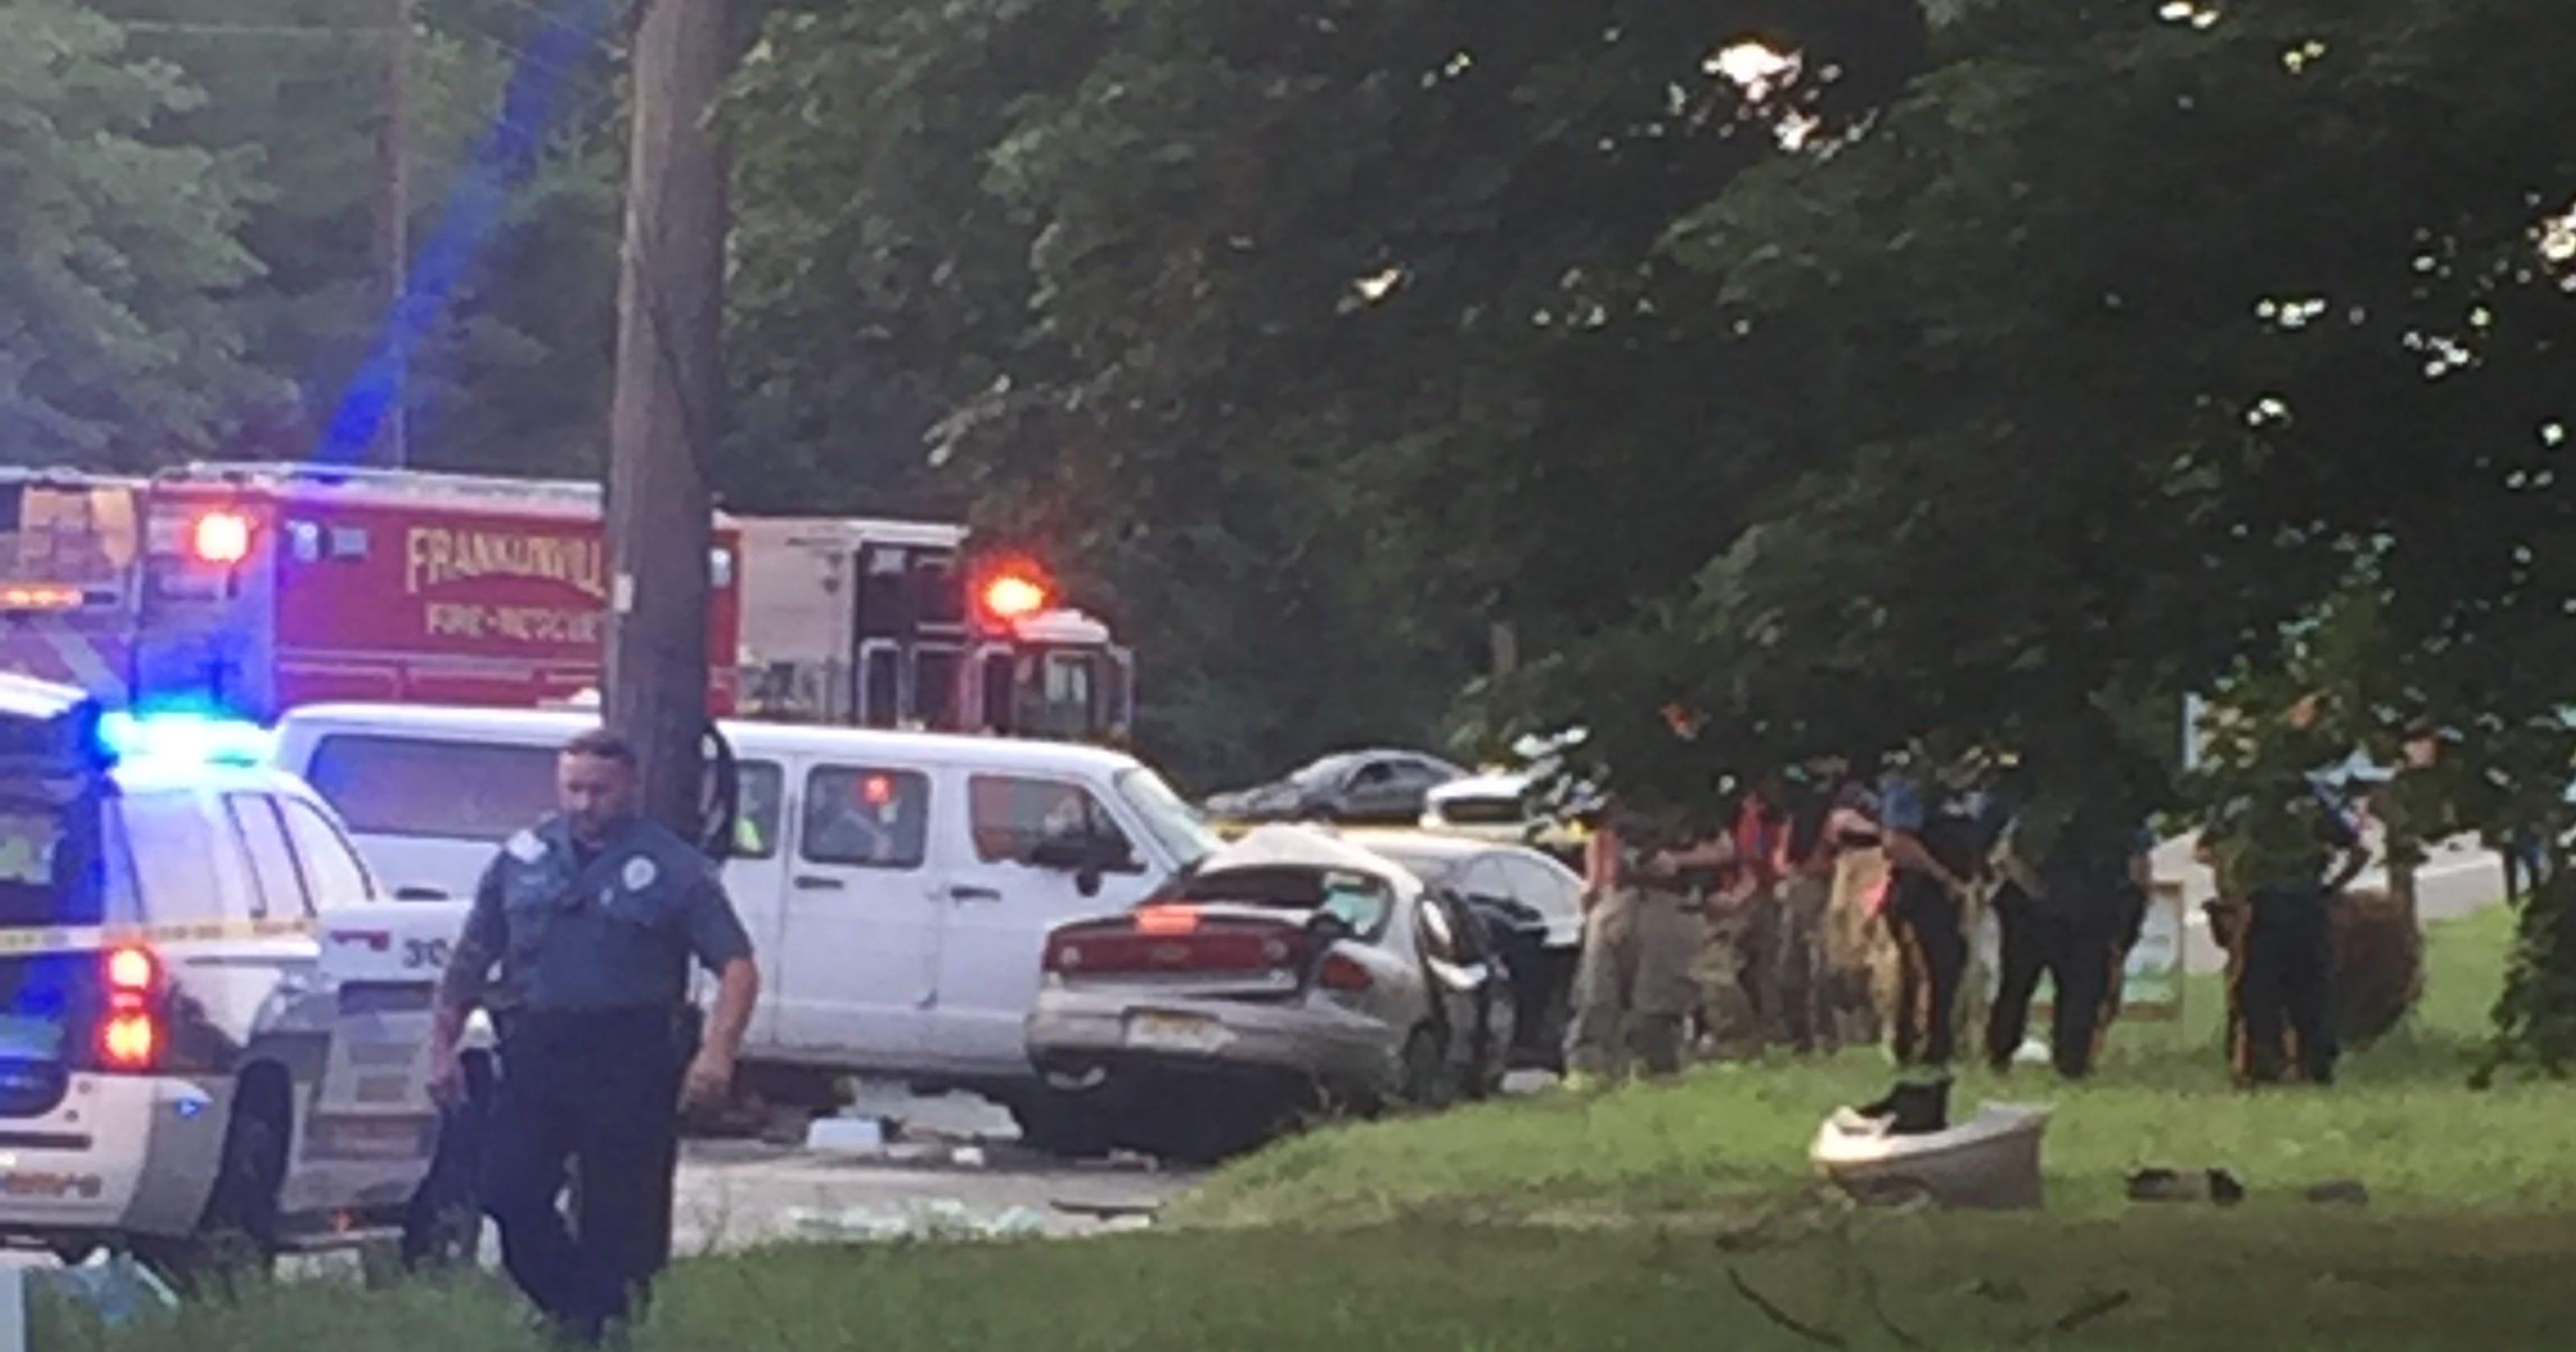 1 dead, 4 hurt in Franklin crash